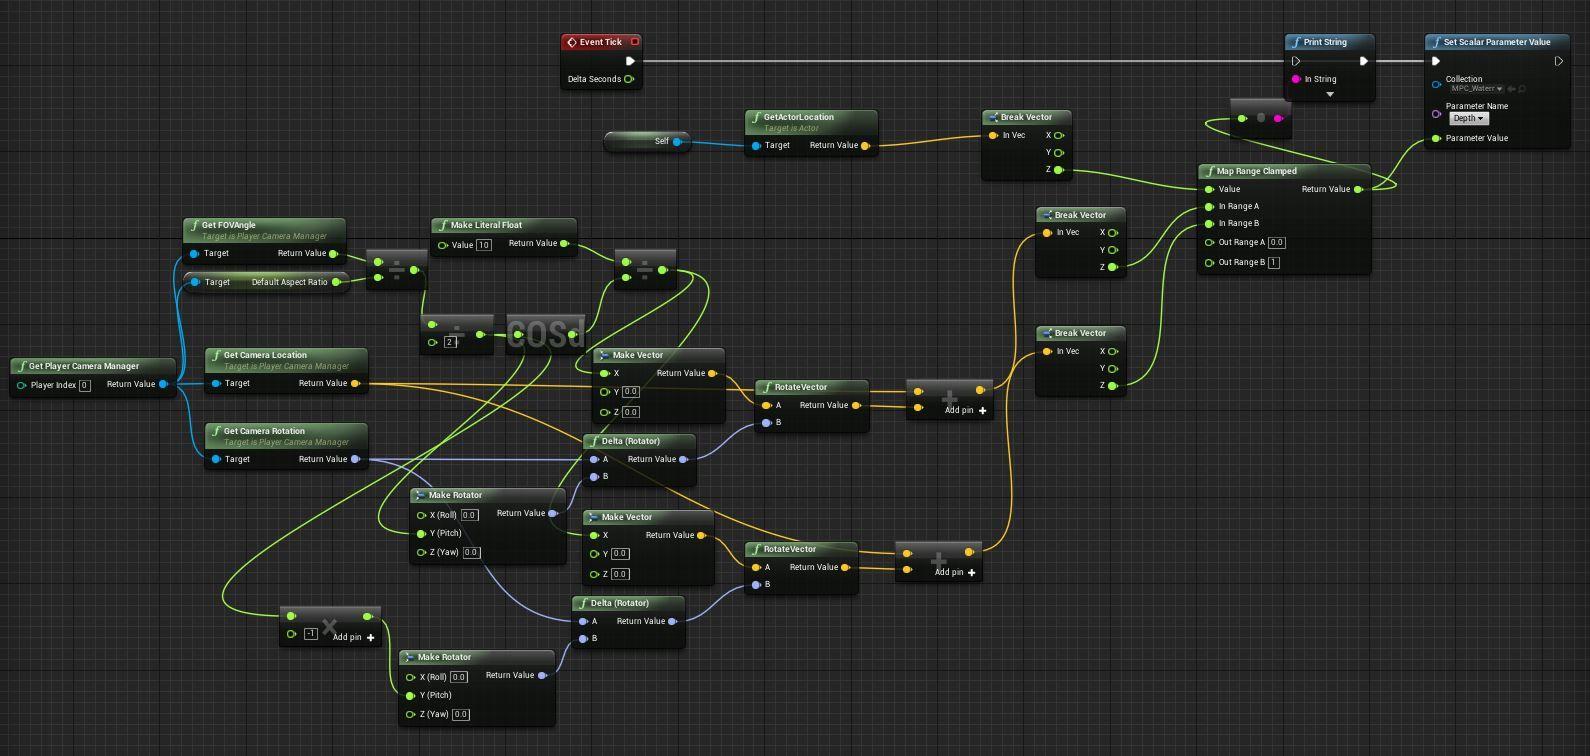 UE4, Half/ Underwater (2/ 3) blueprint Video game